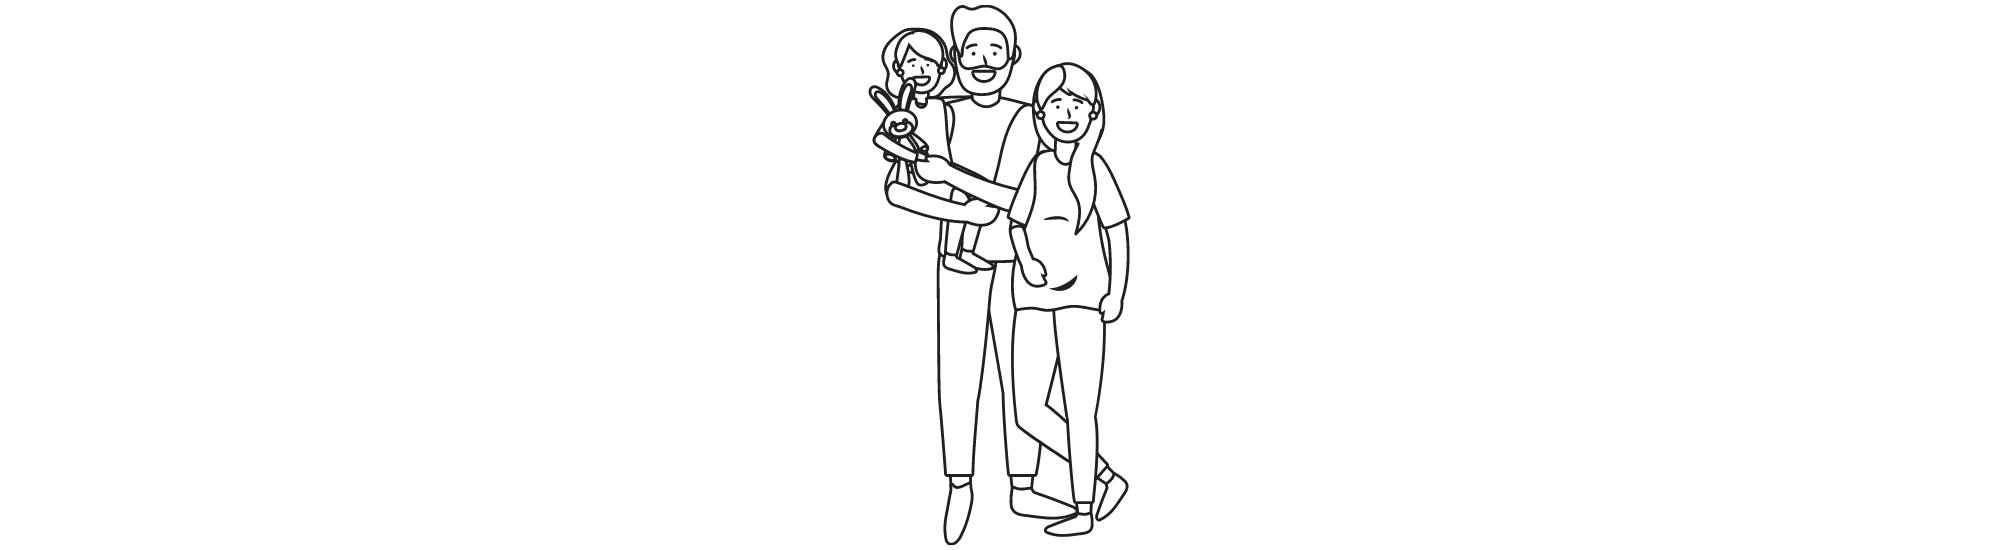 Dessin représentant Cléo & Jade en famille